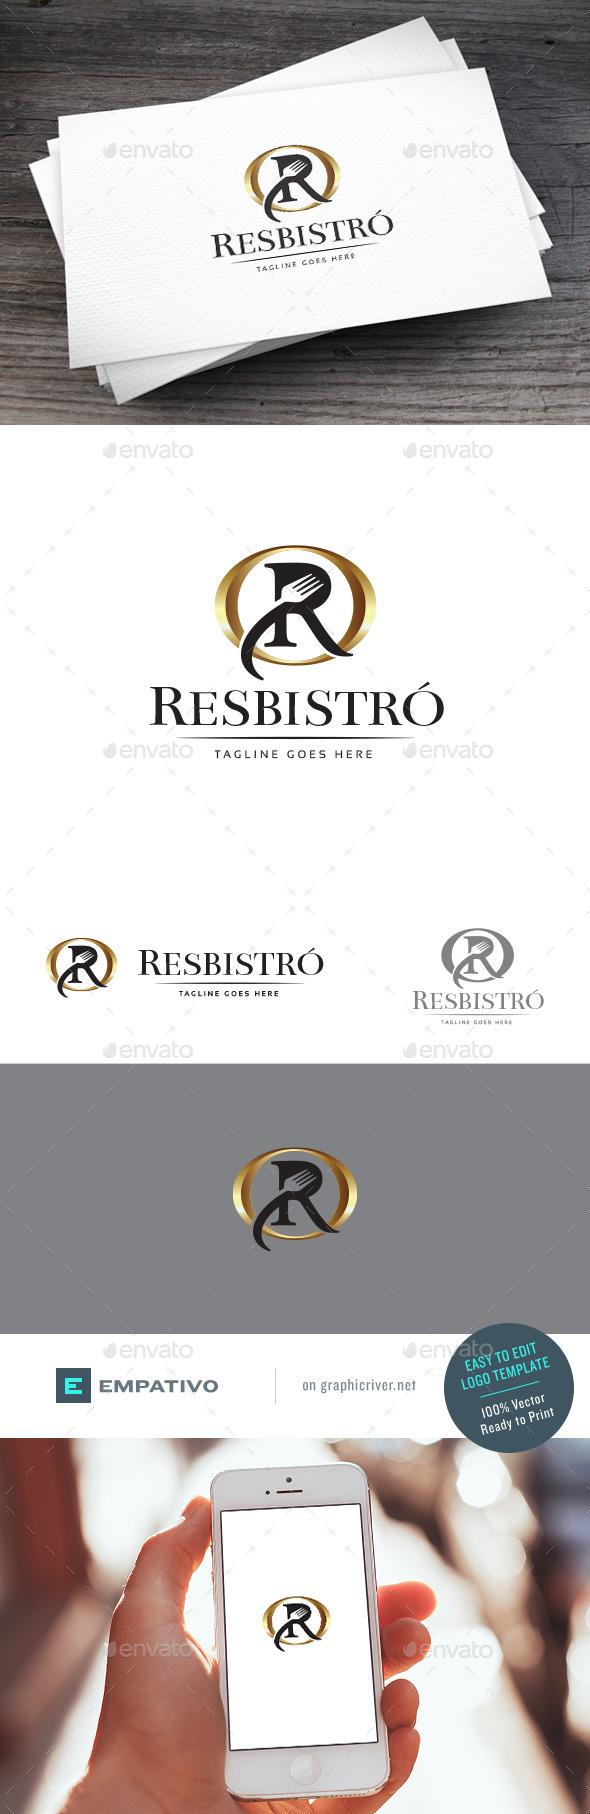 GraphicRiver Resbistro Logo Template 11100987